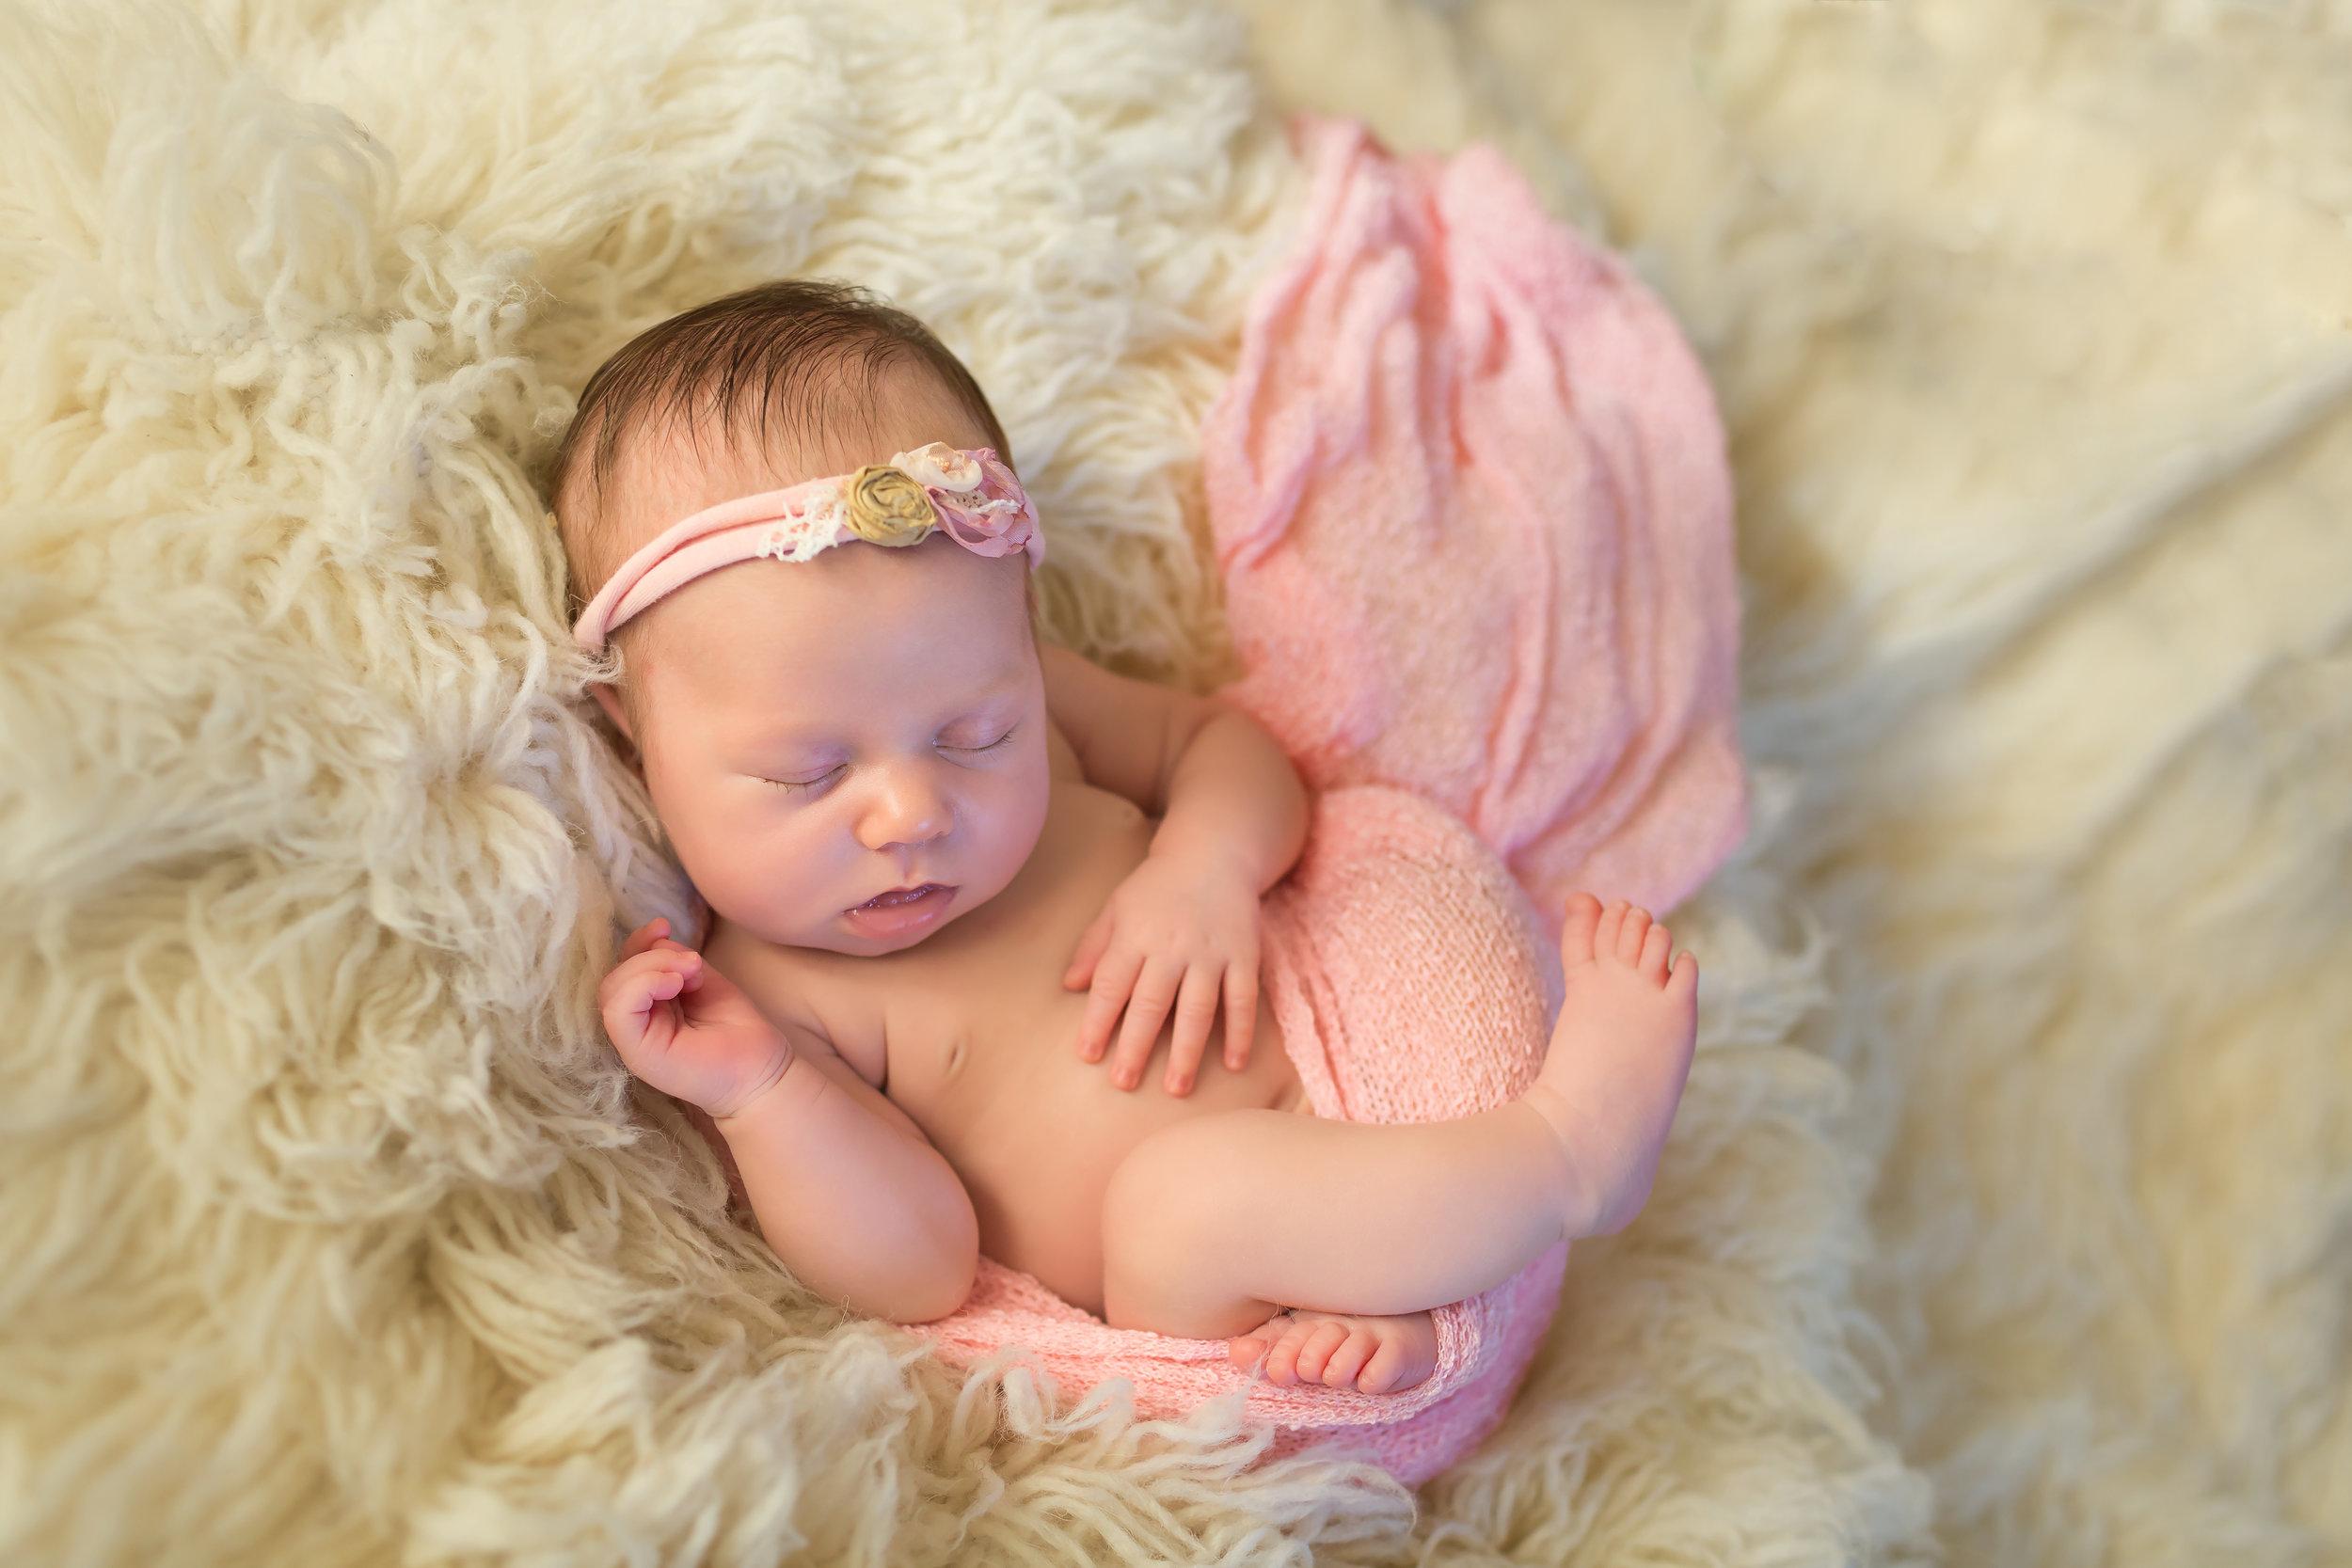 San Diego Newborn captured by Studio Freyja Newborns - a premier fine art newborn photographer in San Diego, CA